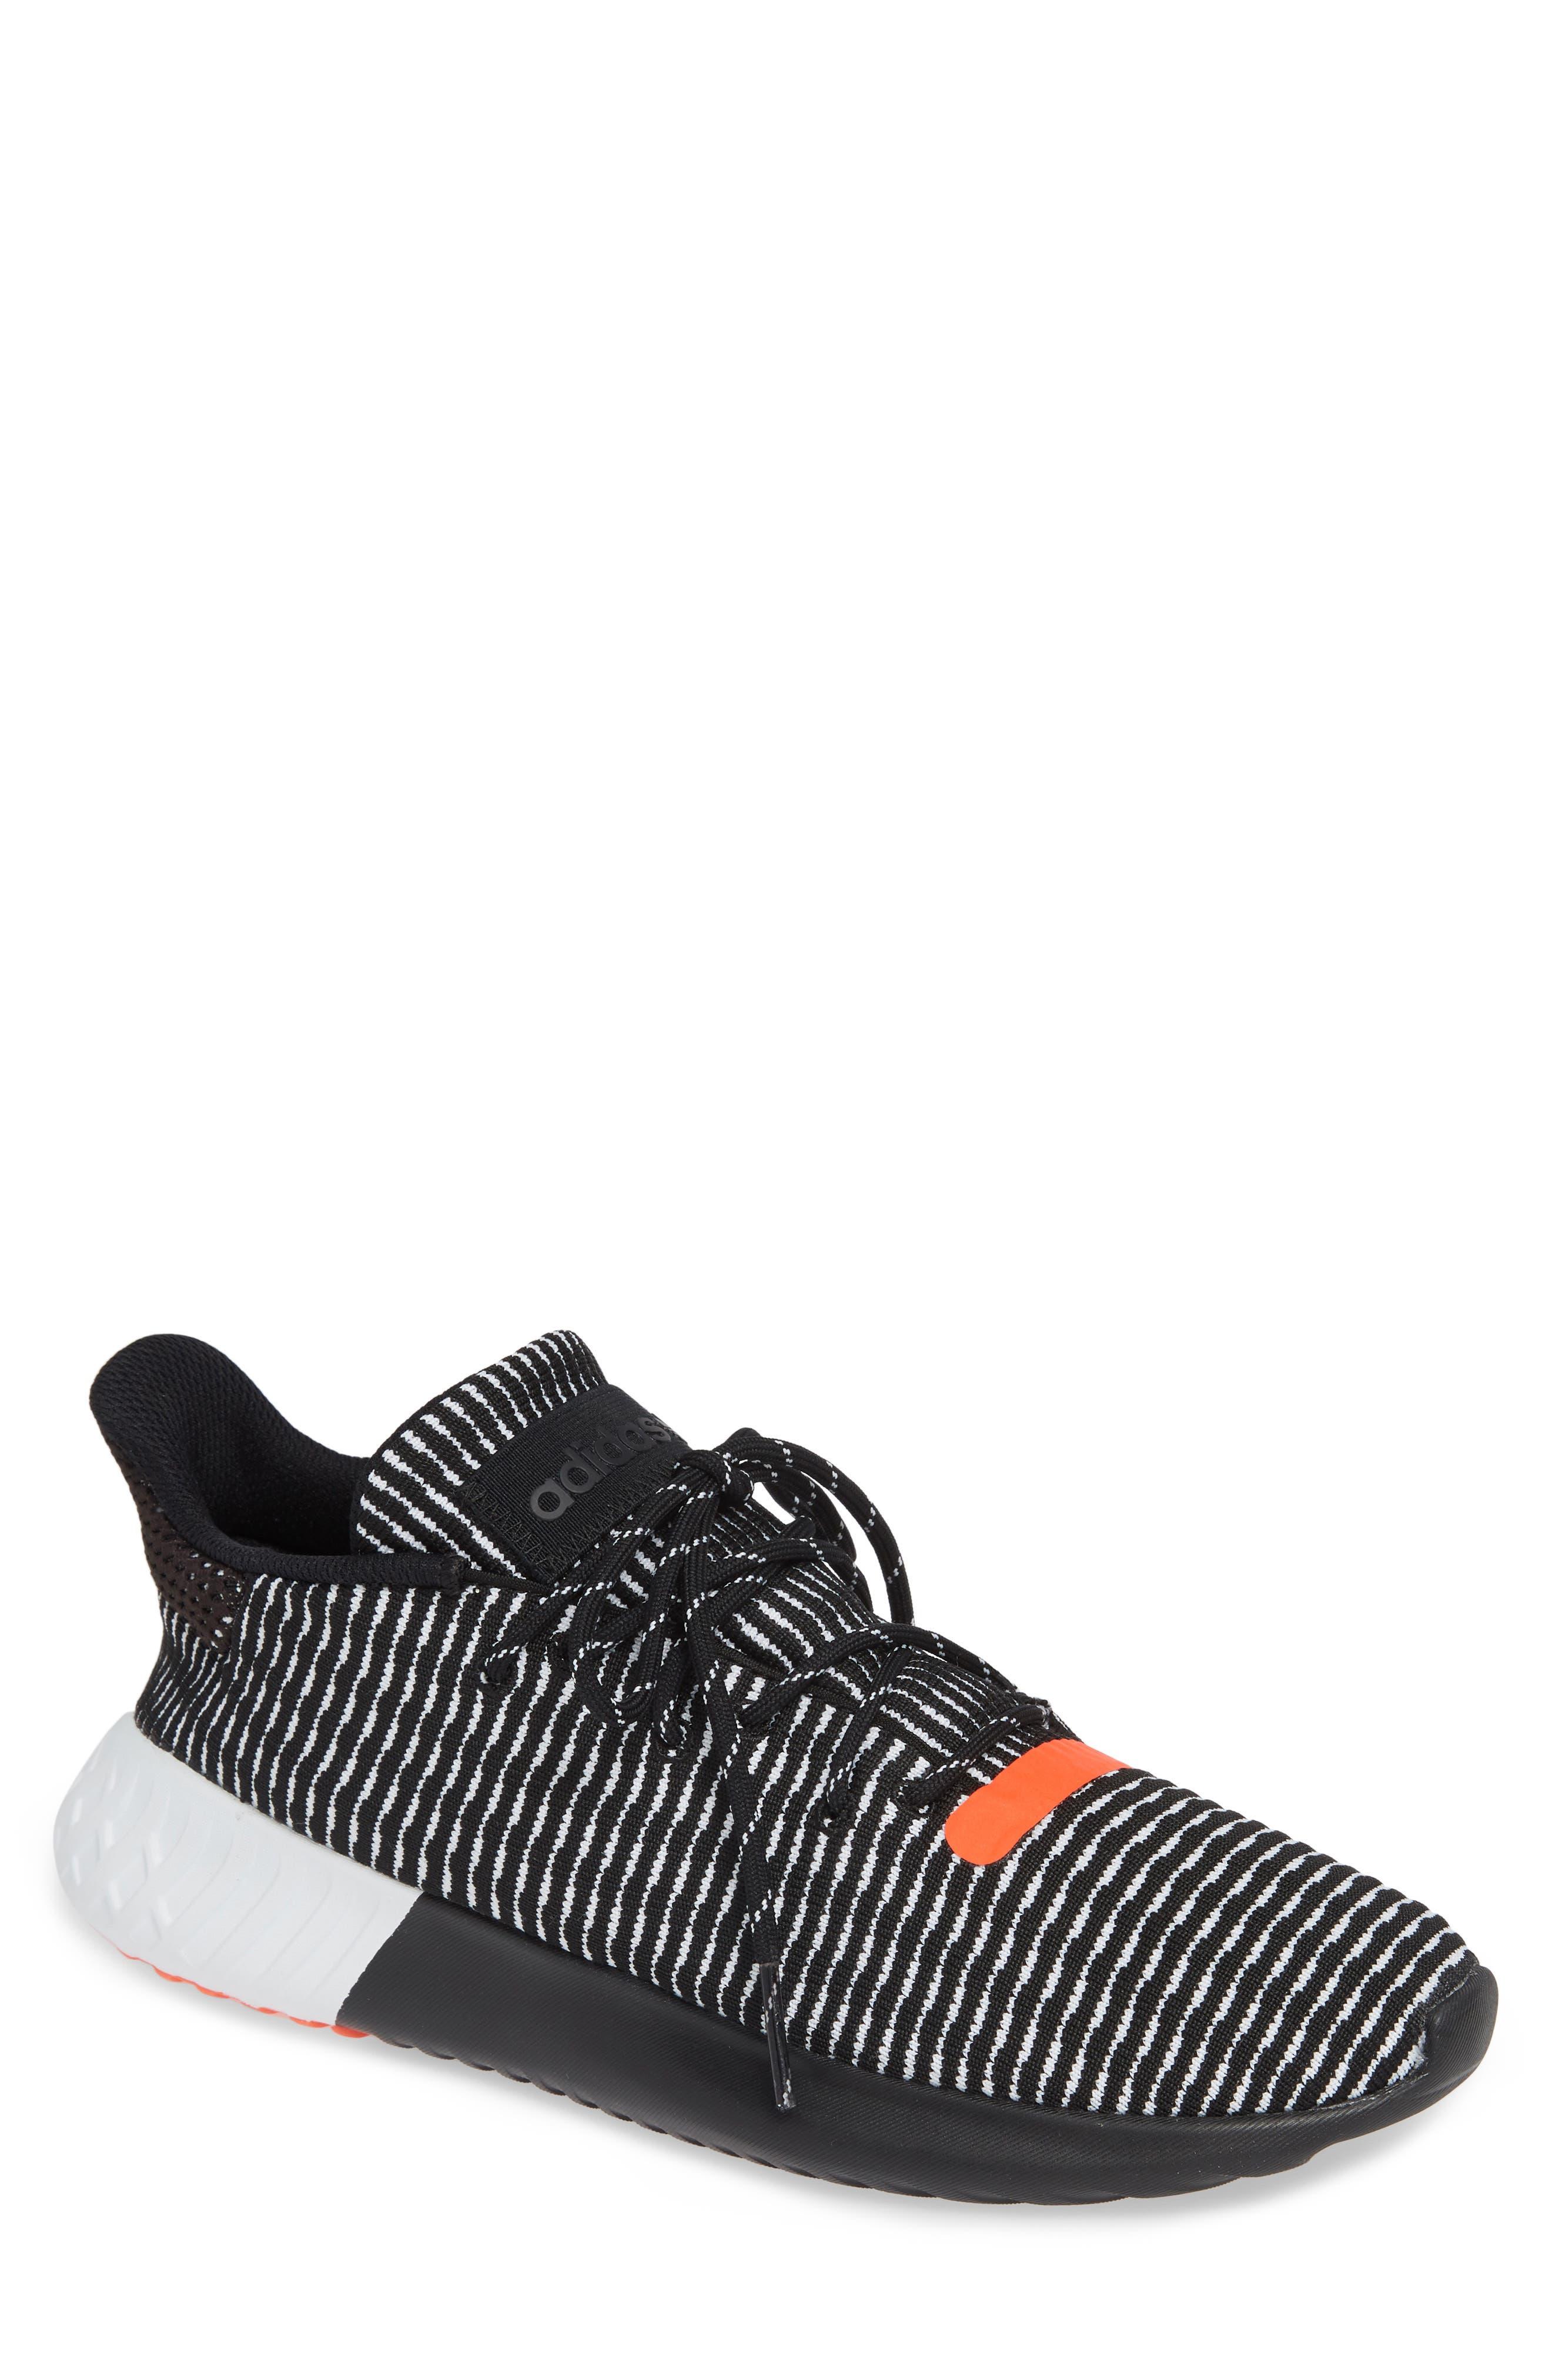 Tubular Dusk Primeknit Sneaker,                             Main thumbnail 1, color,                             BLACK/ WHITE/ SOLAR RED